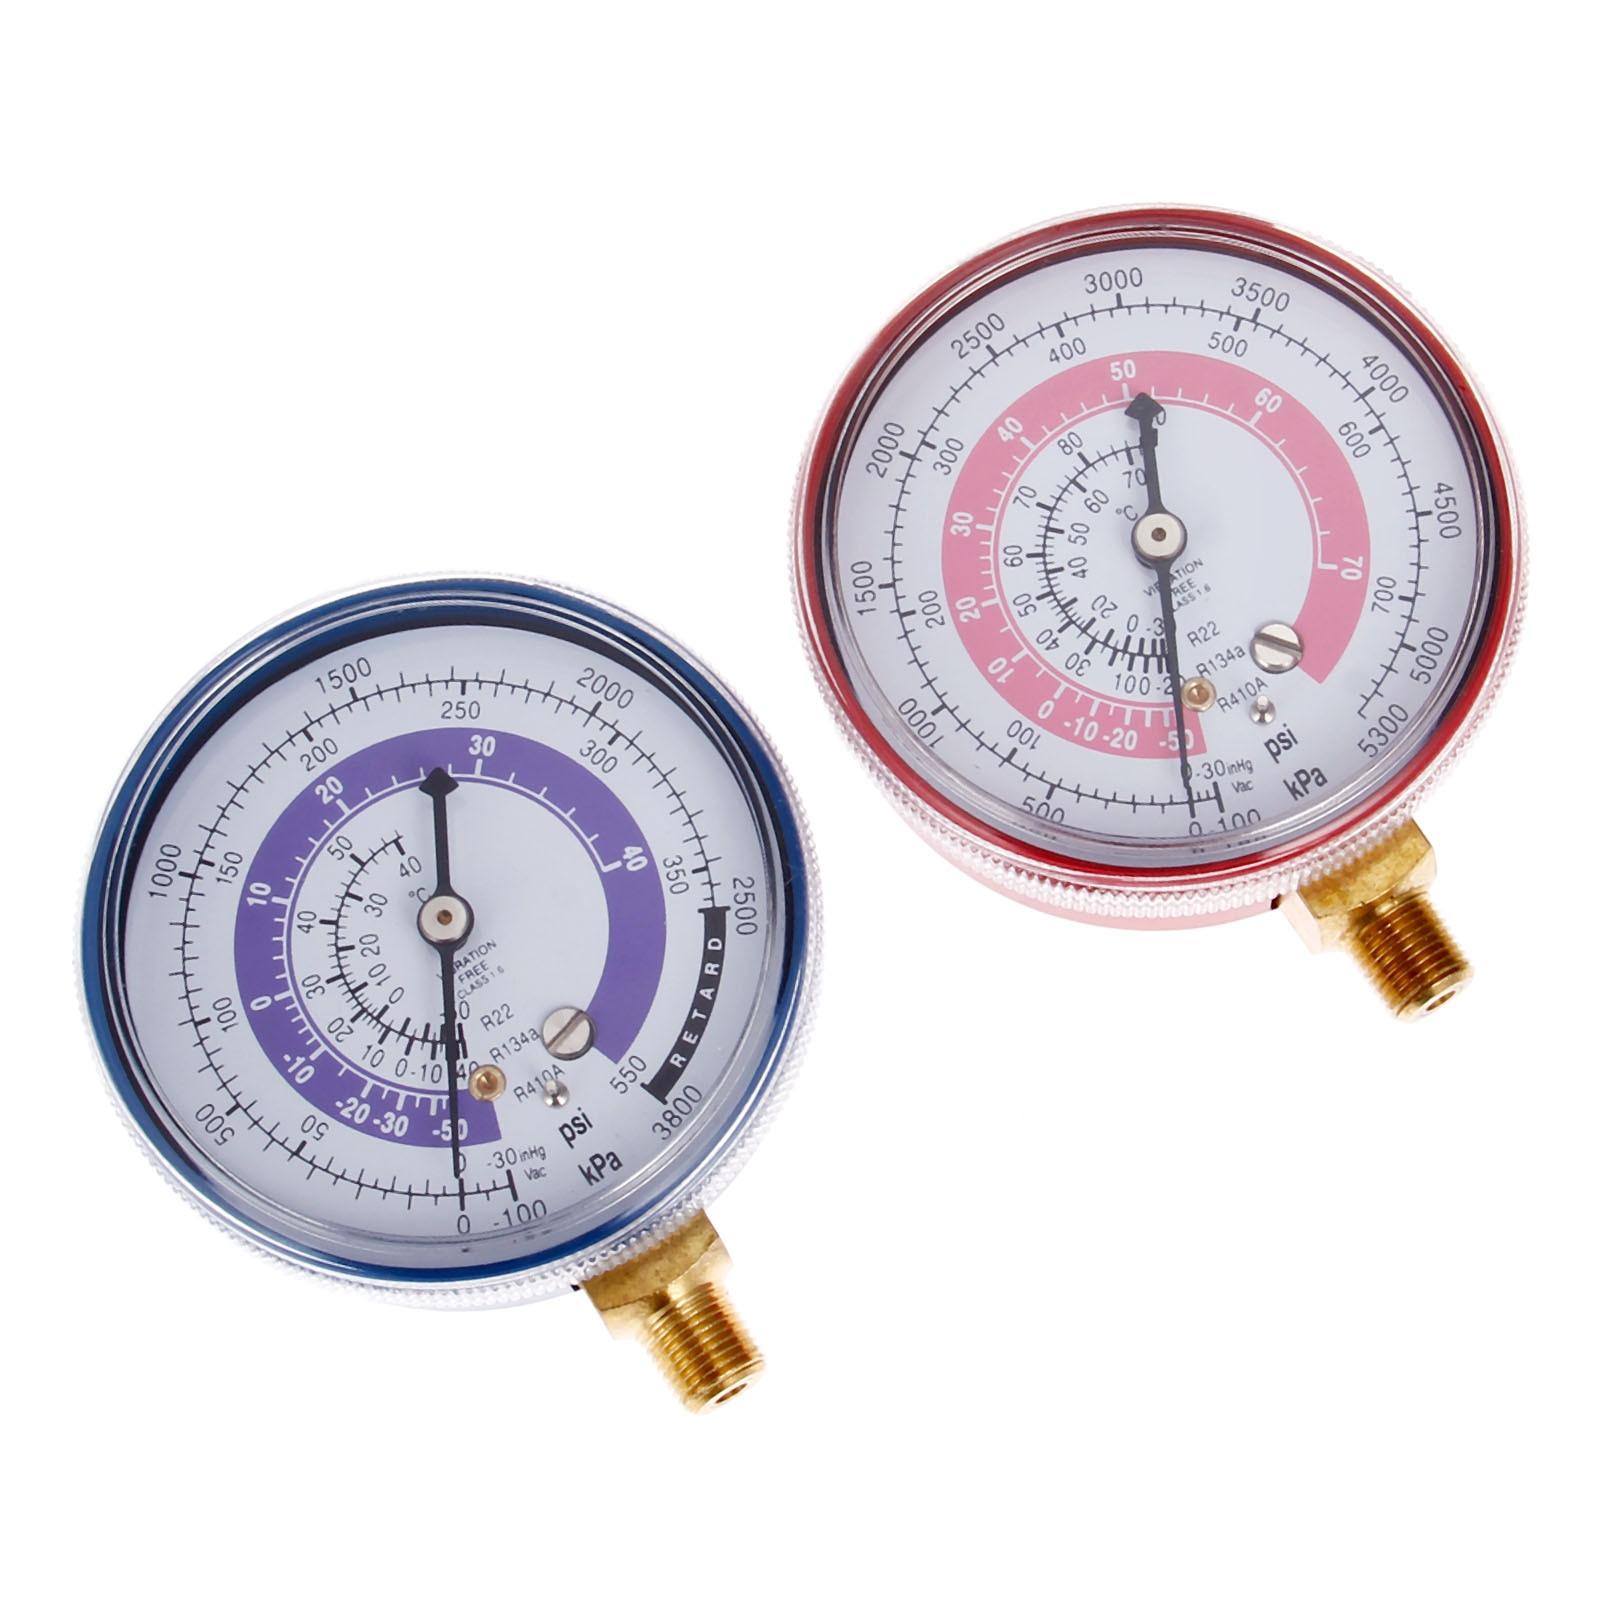 Yetaha 2Pcs R22 R12 R134a R410 High & Low Refrigerant Pressure Gauge 1/8''  NPT Air Conditioner Pressure Gauge